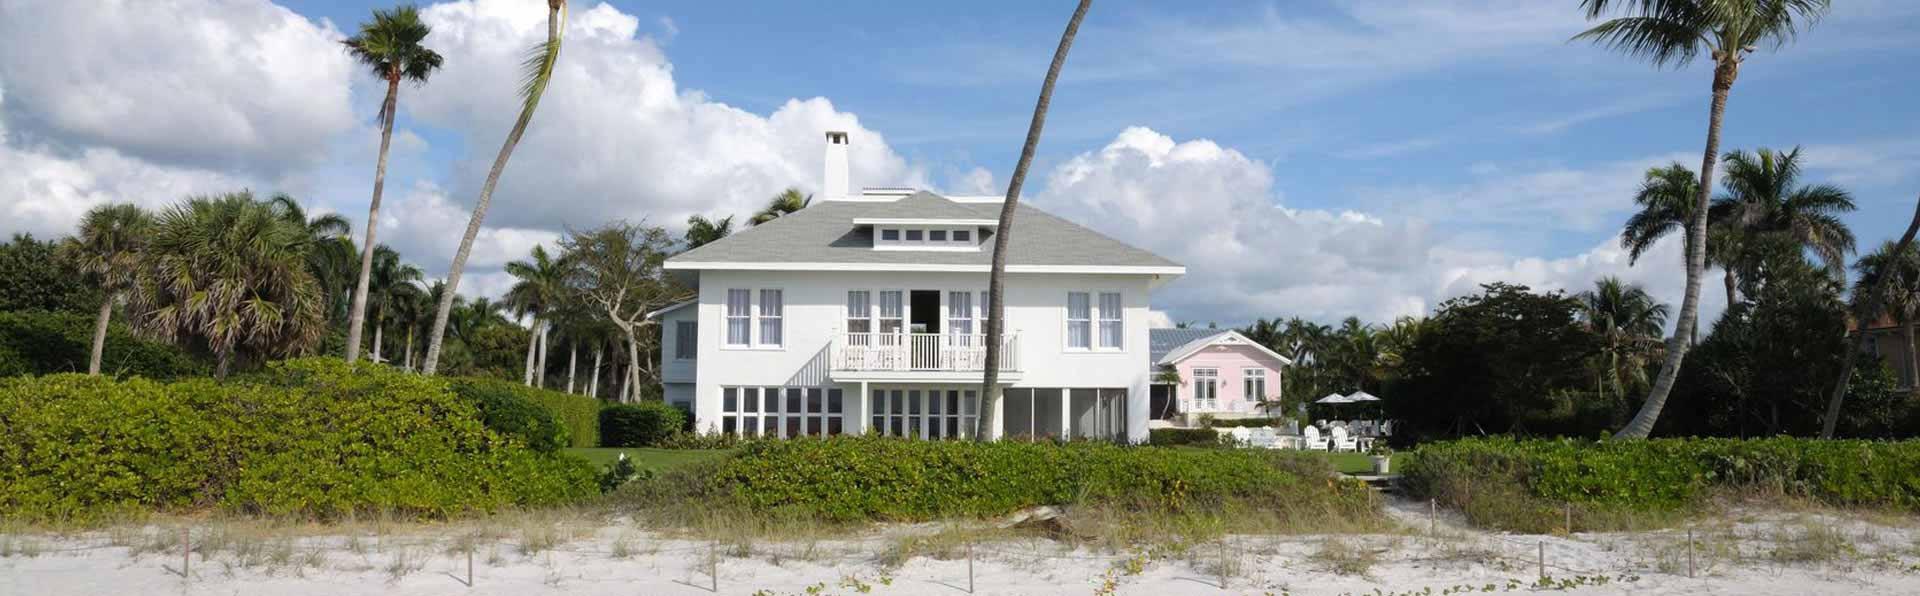 Photo of white 2 story house on beach in Sanibel Island, FL.